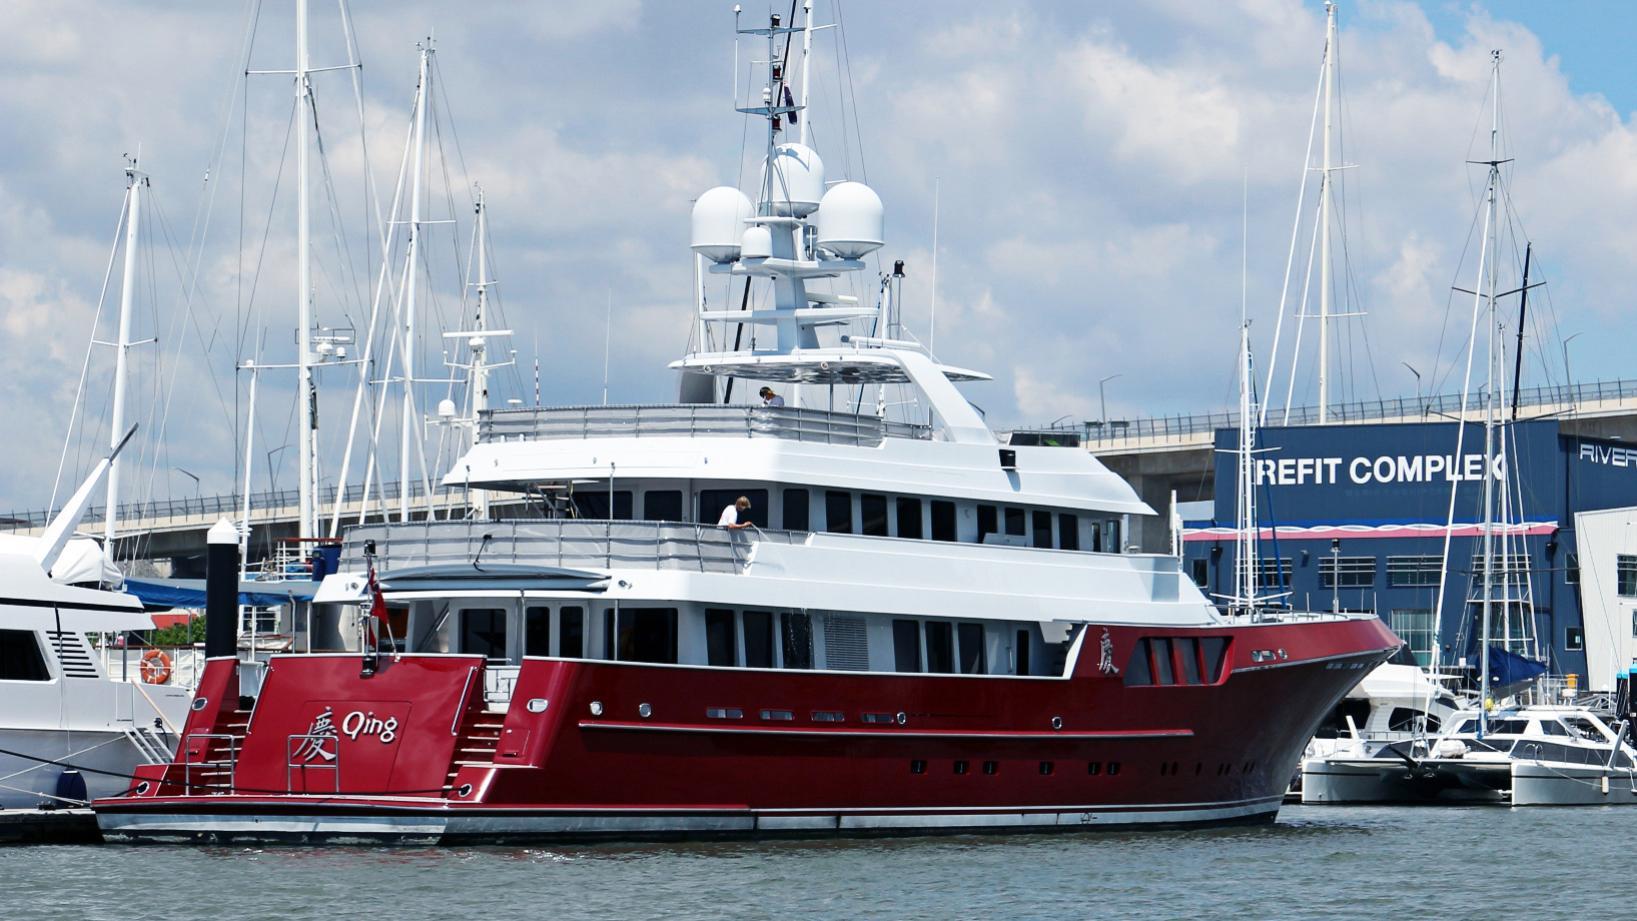 qing-motor-yacht-cheoy-lee-2012-46m-half-stern